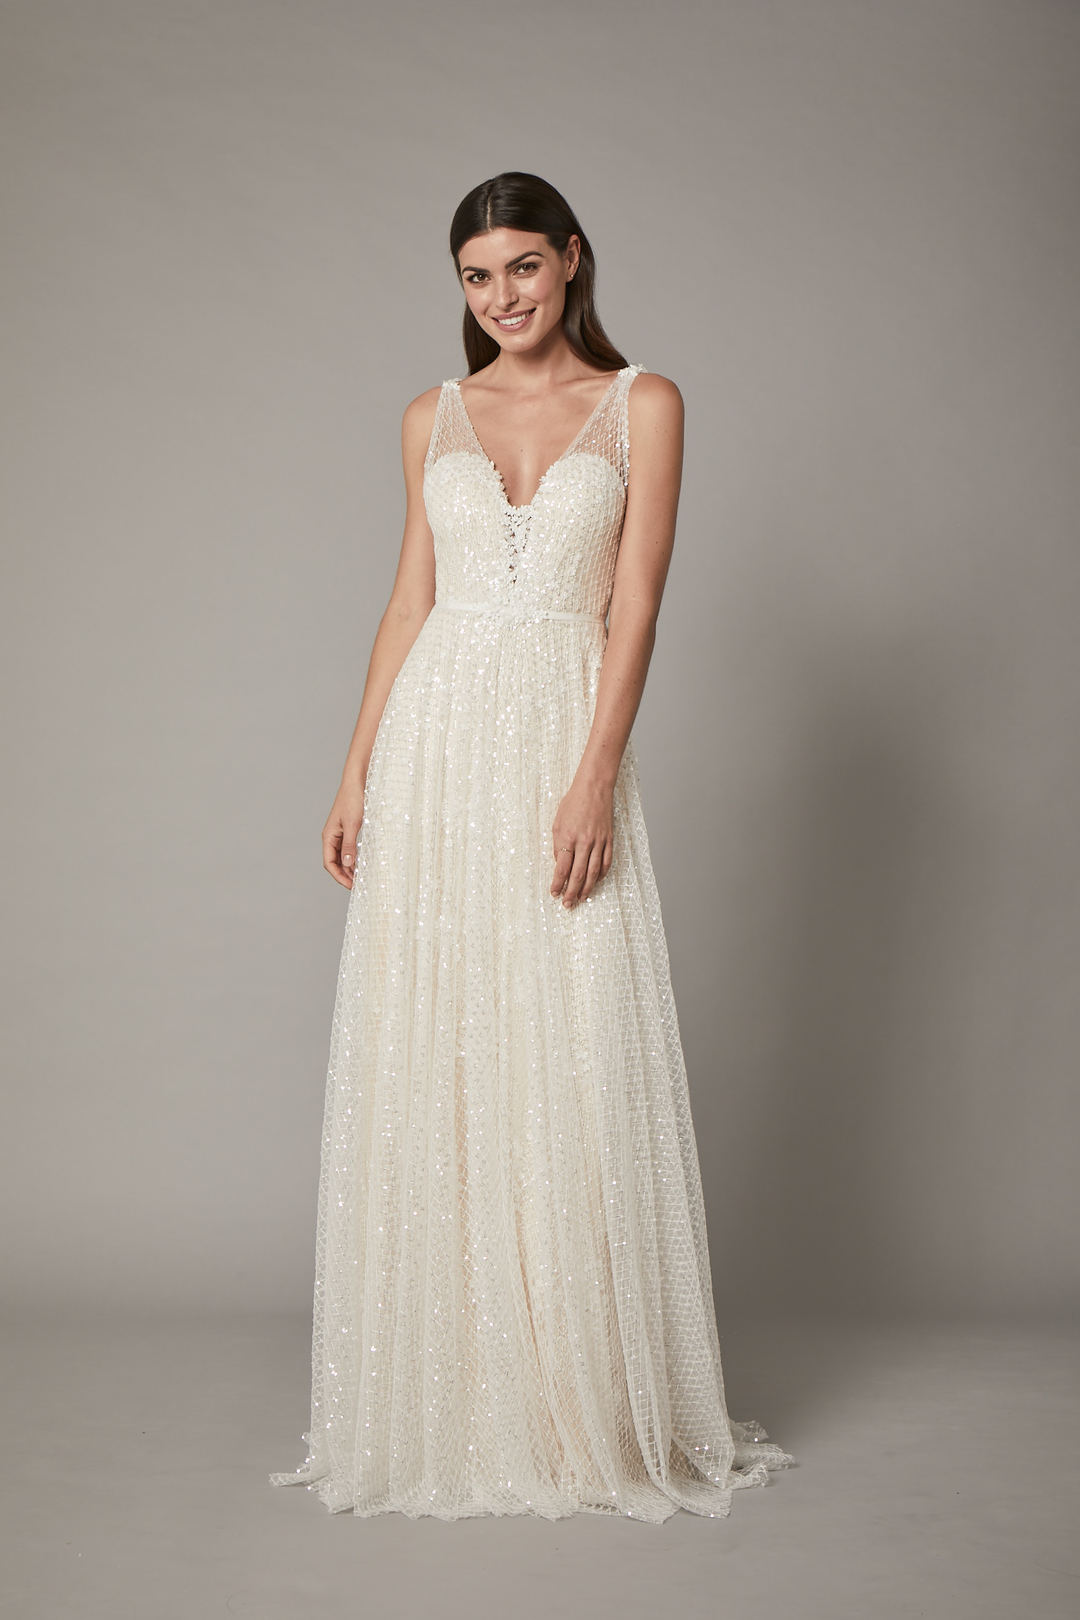 rachel gown dress photo